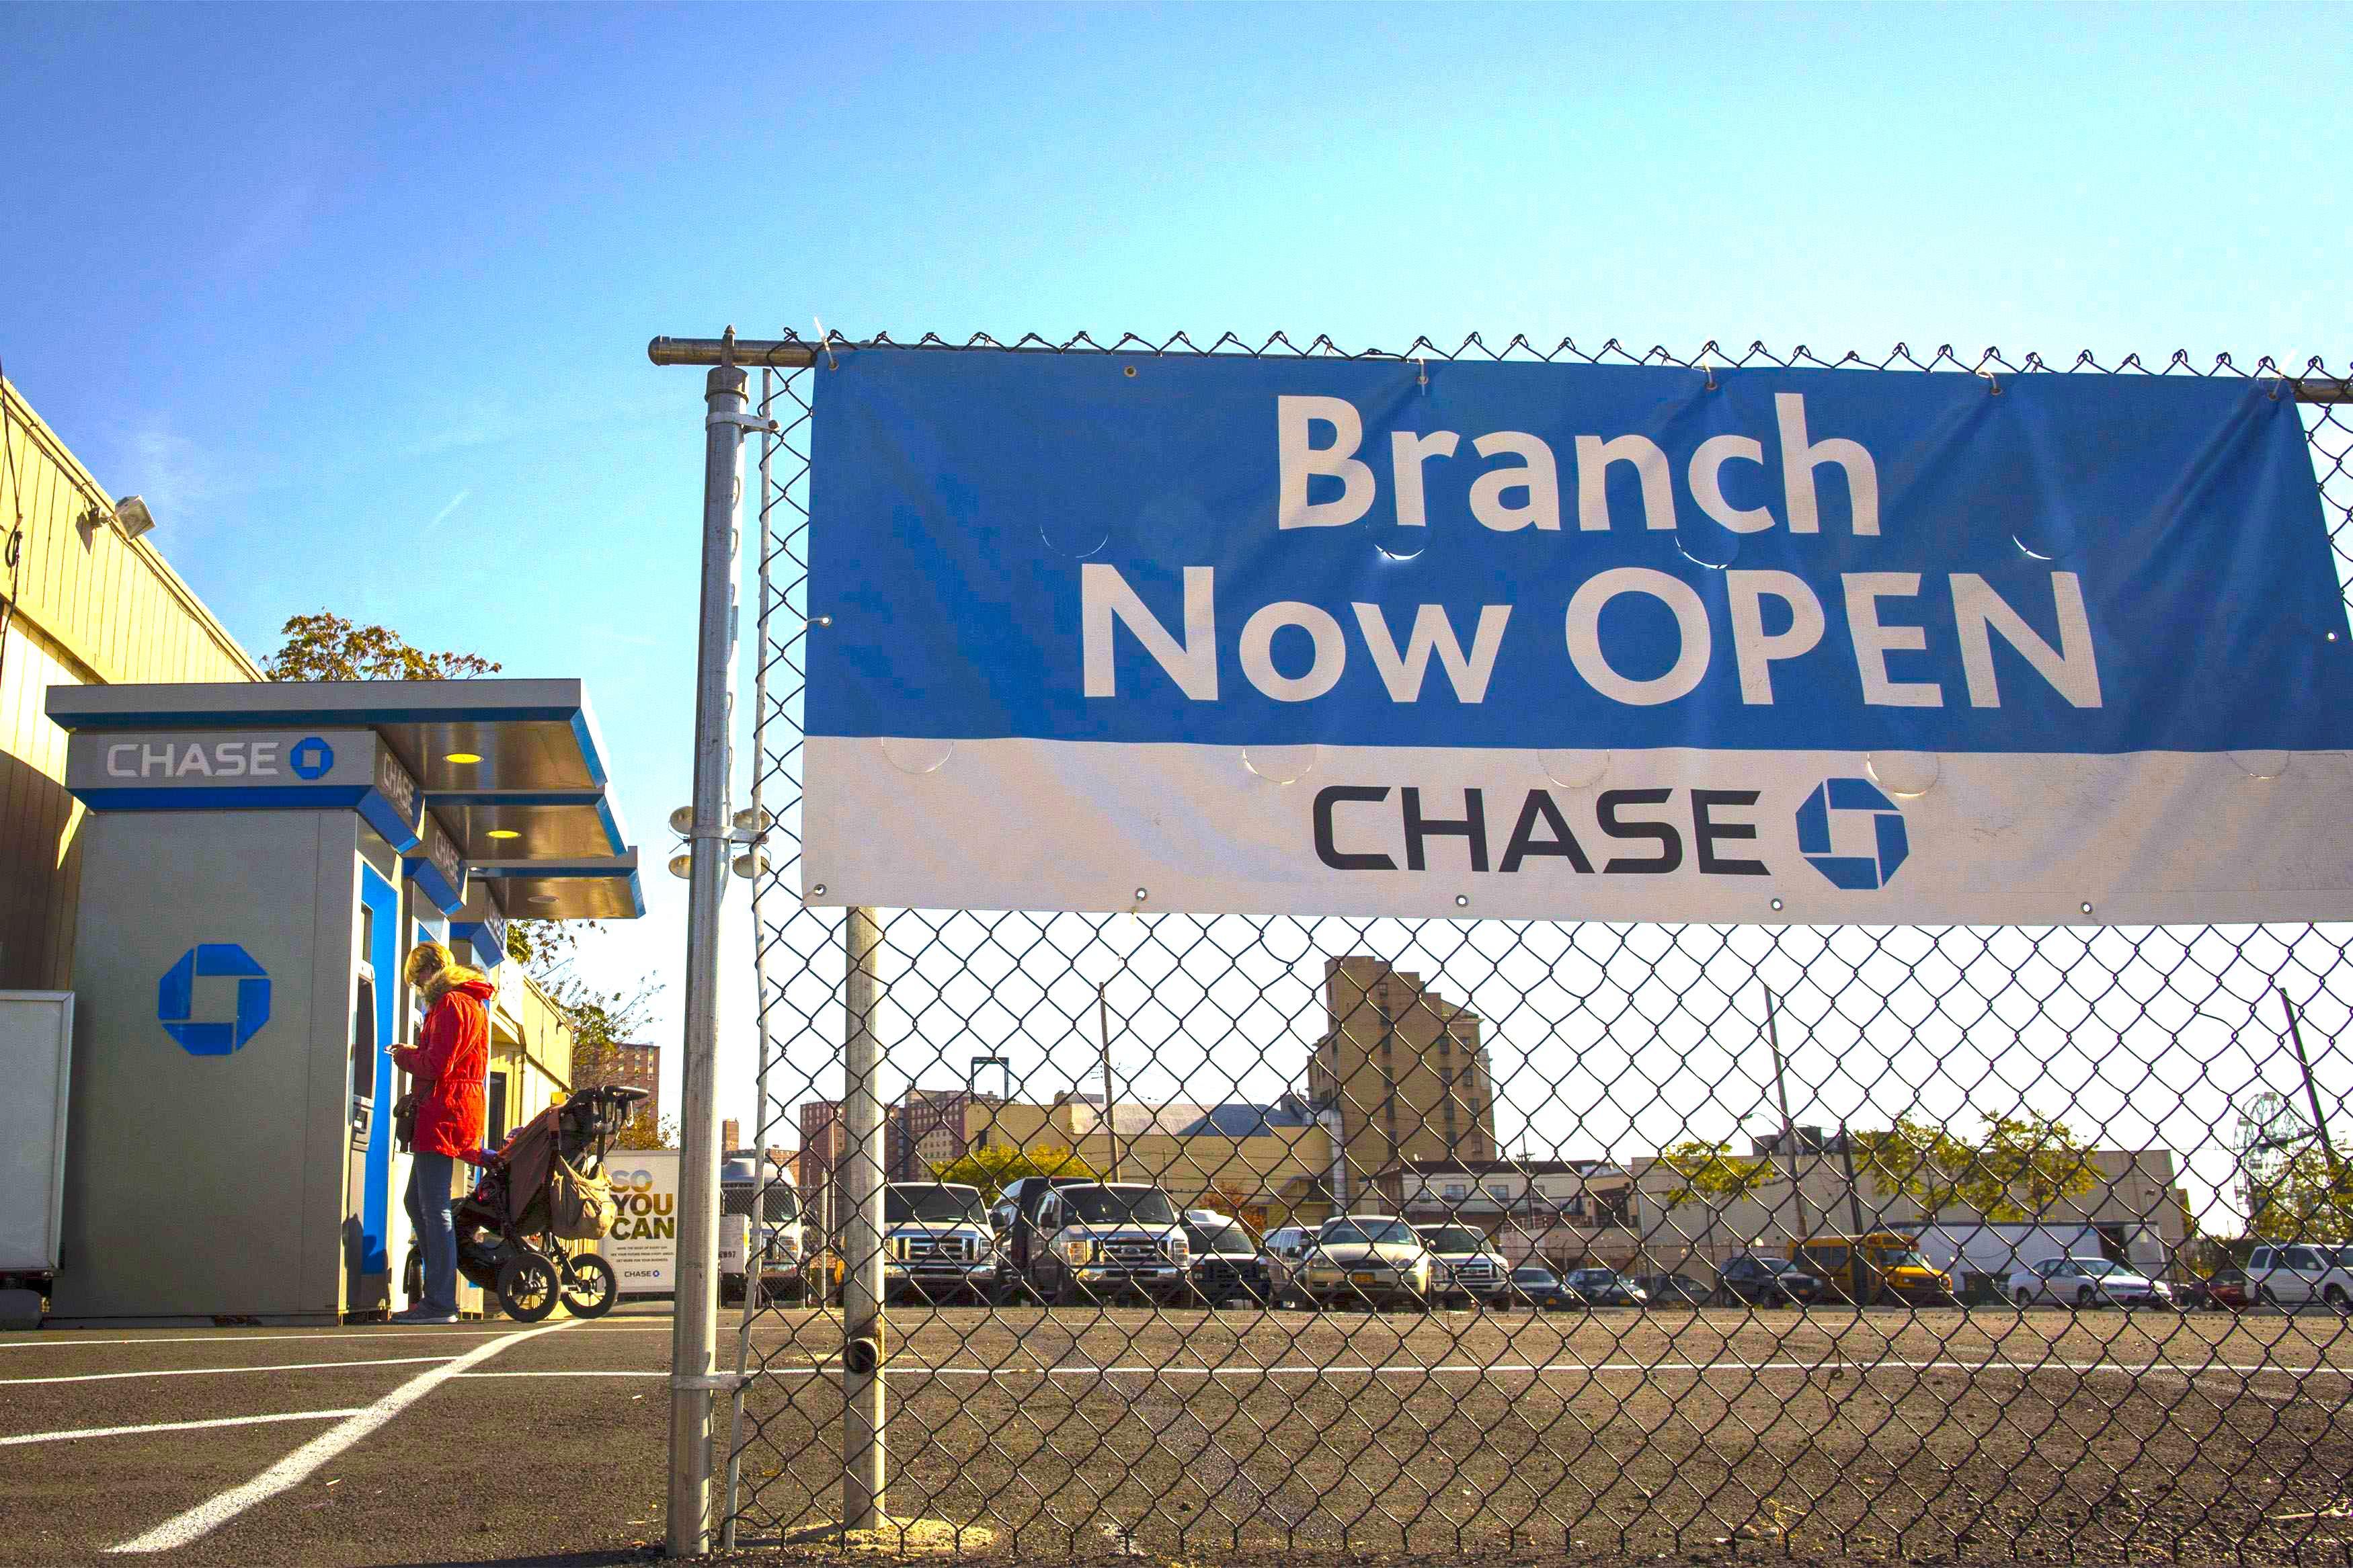 Chase to open branches in Minneapolis, Nashville, Kansas City, Raleigh